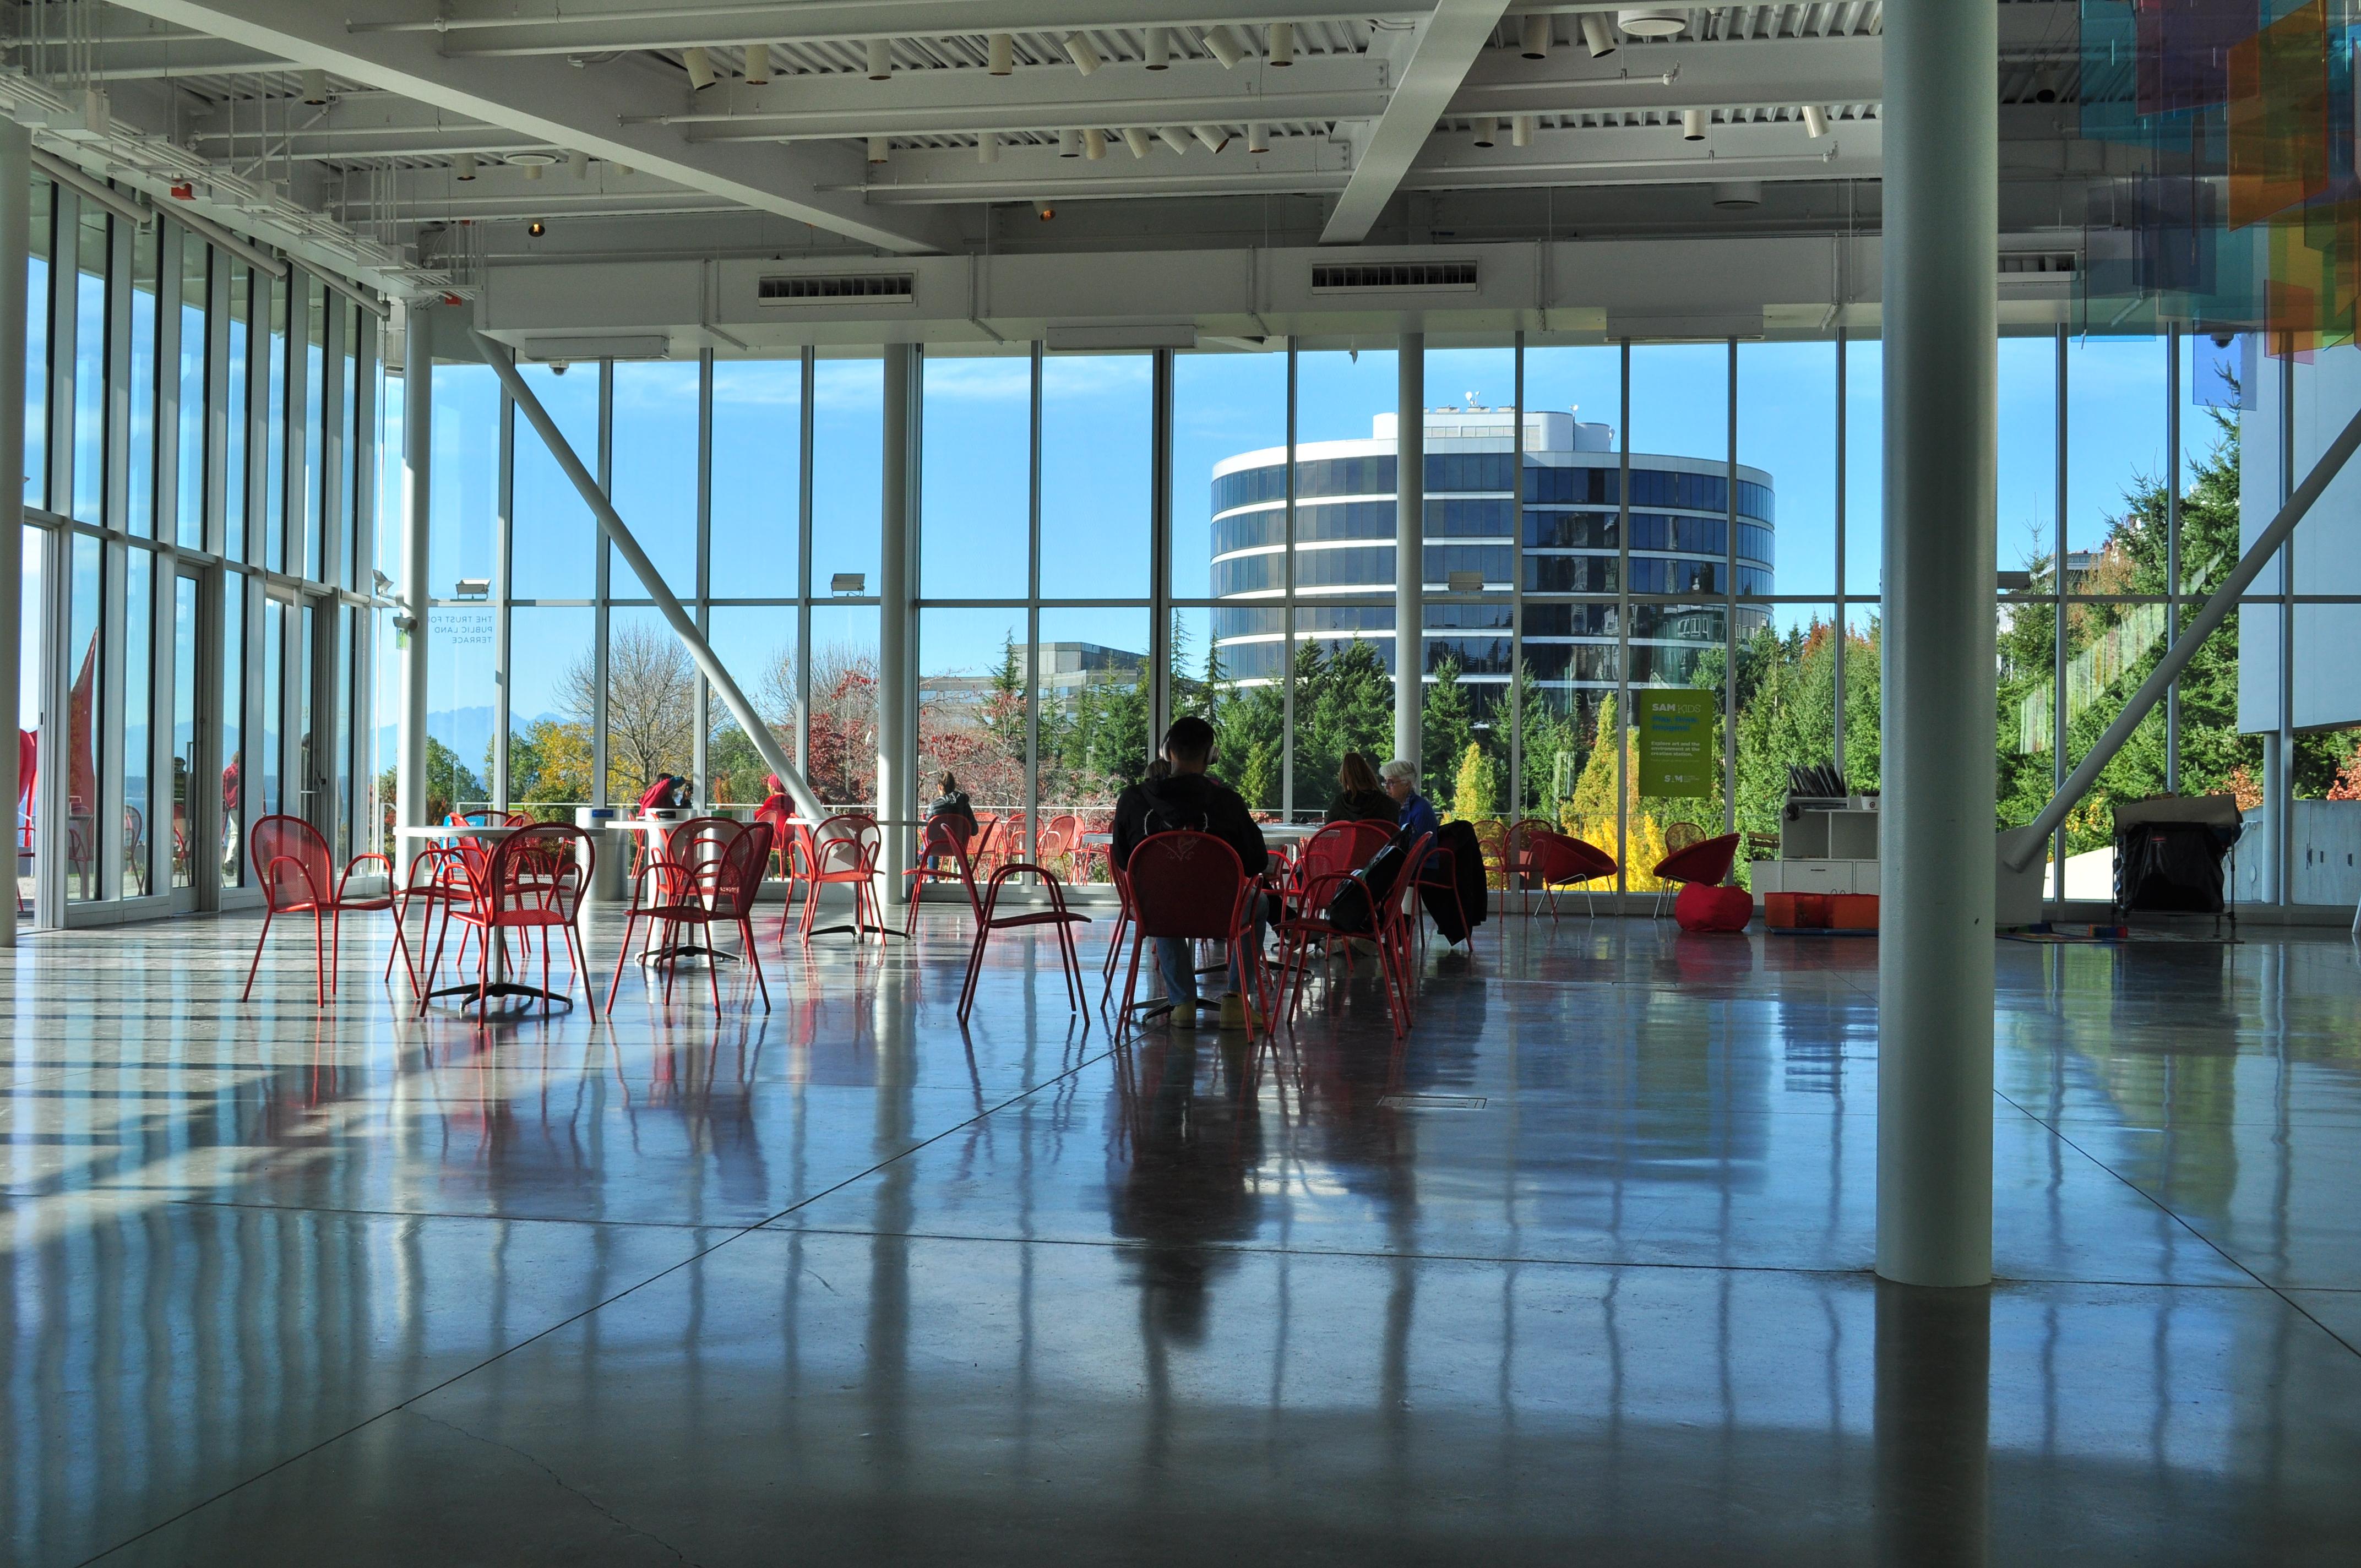 Olympic Sculpture Park - visitor center 01.jpg